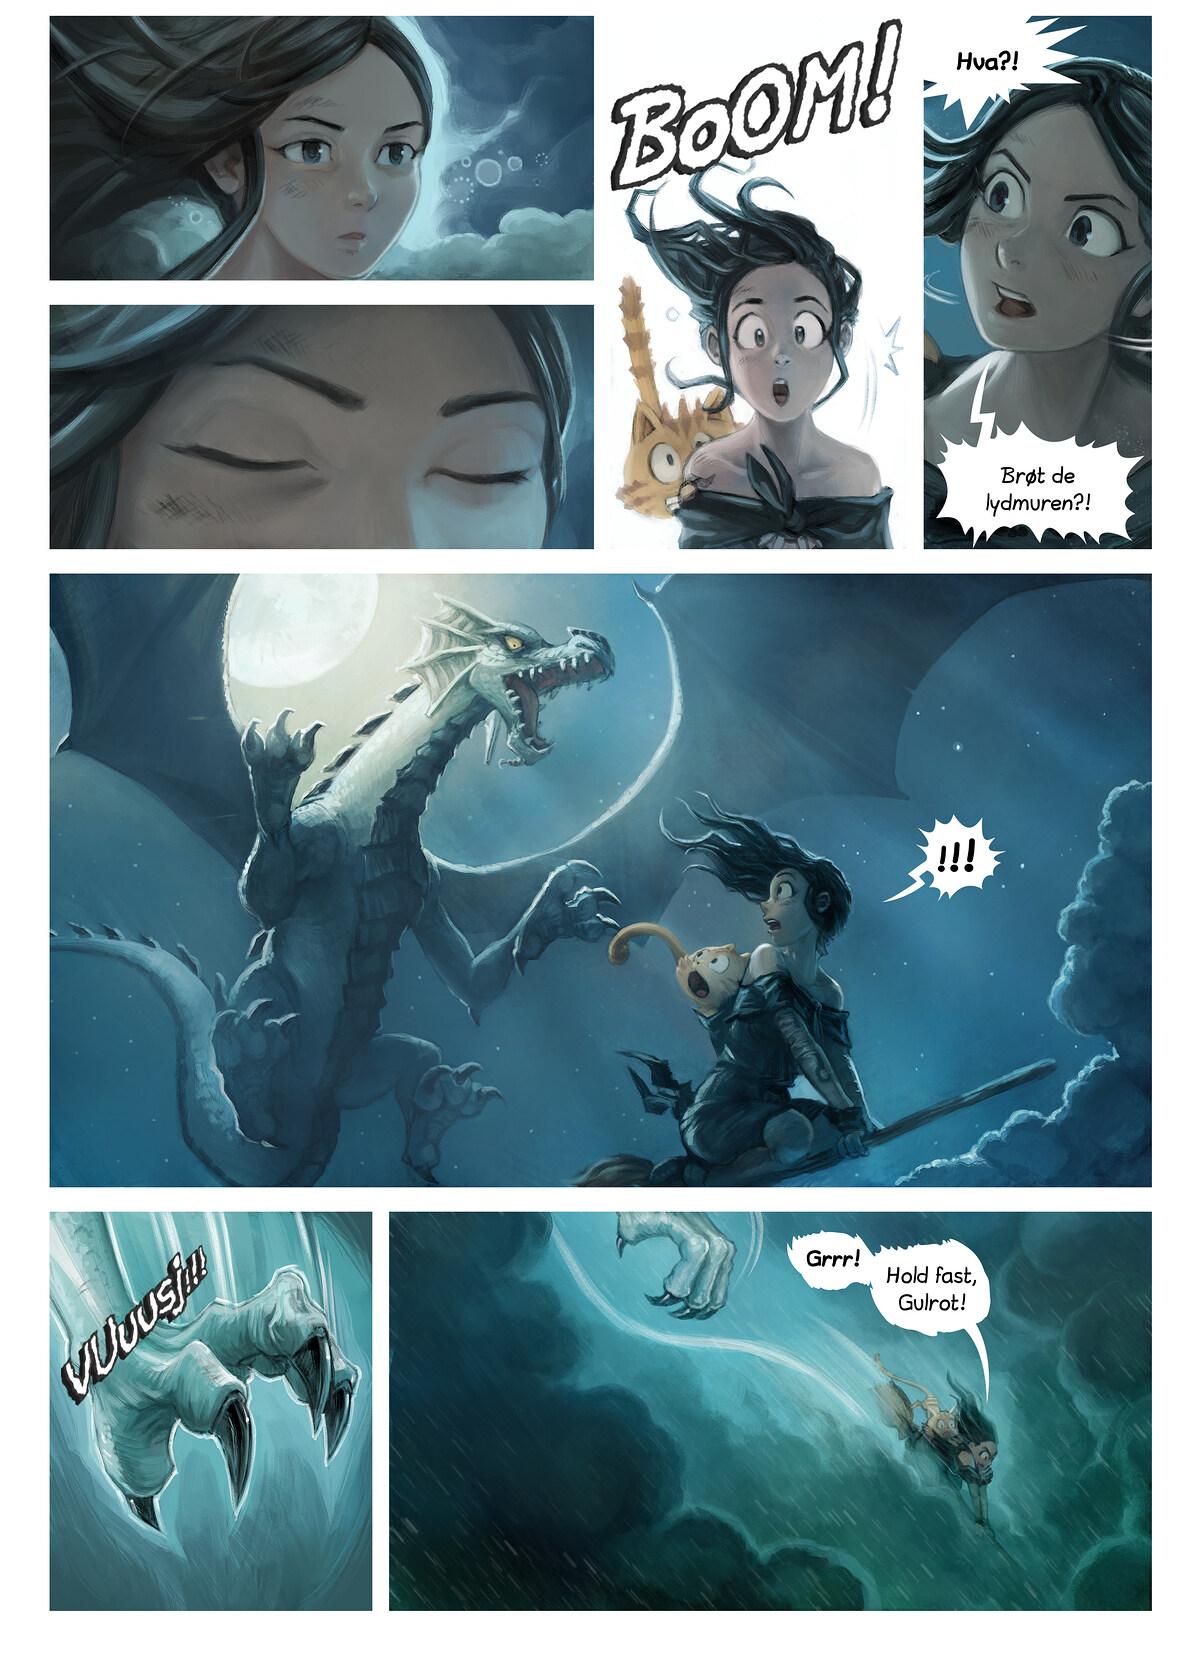 Episode 35: Tid for ettertanke, Page 4